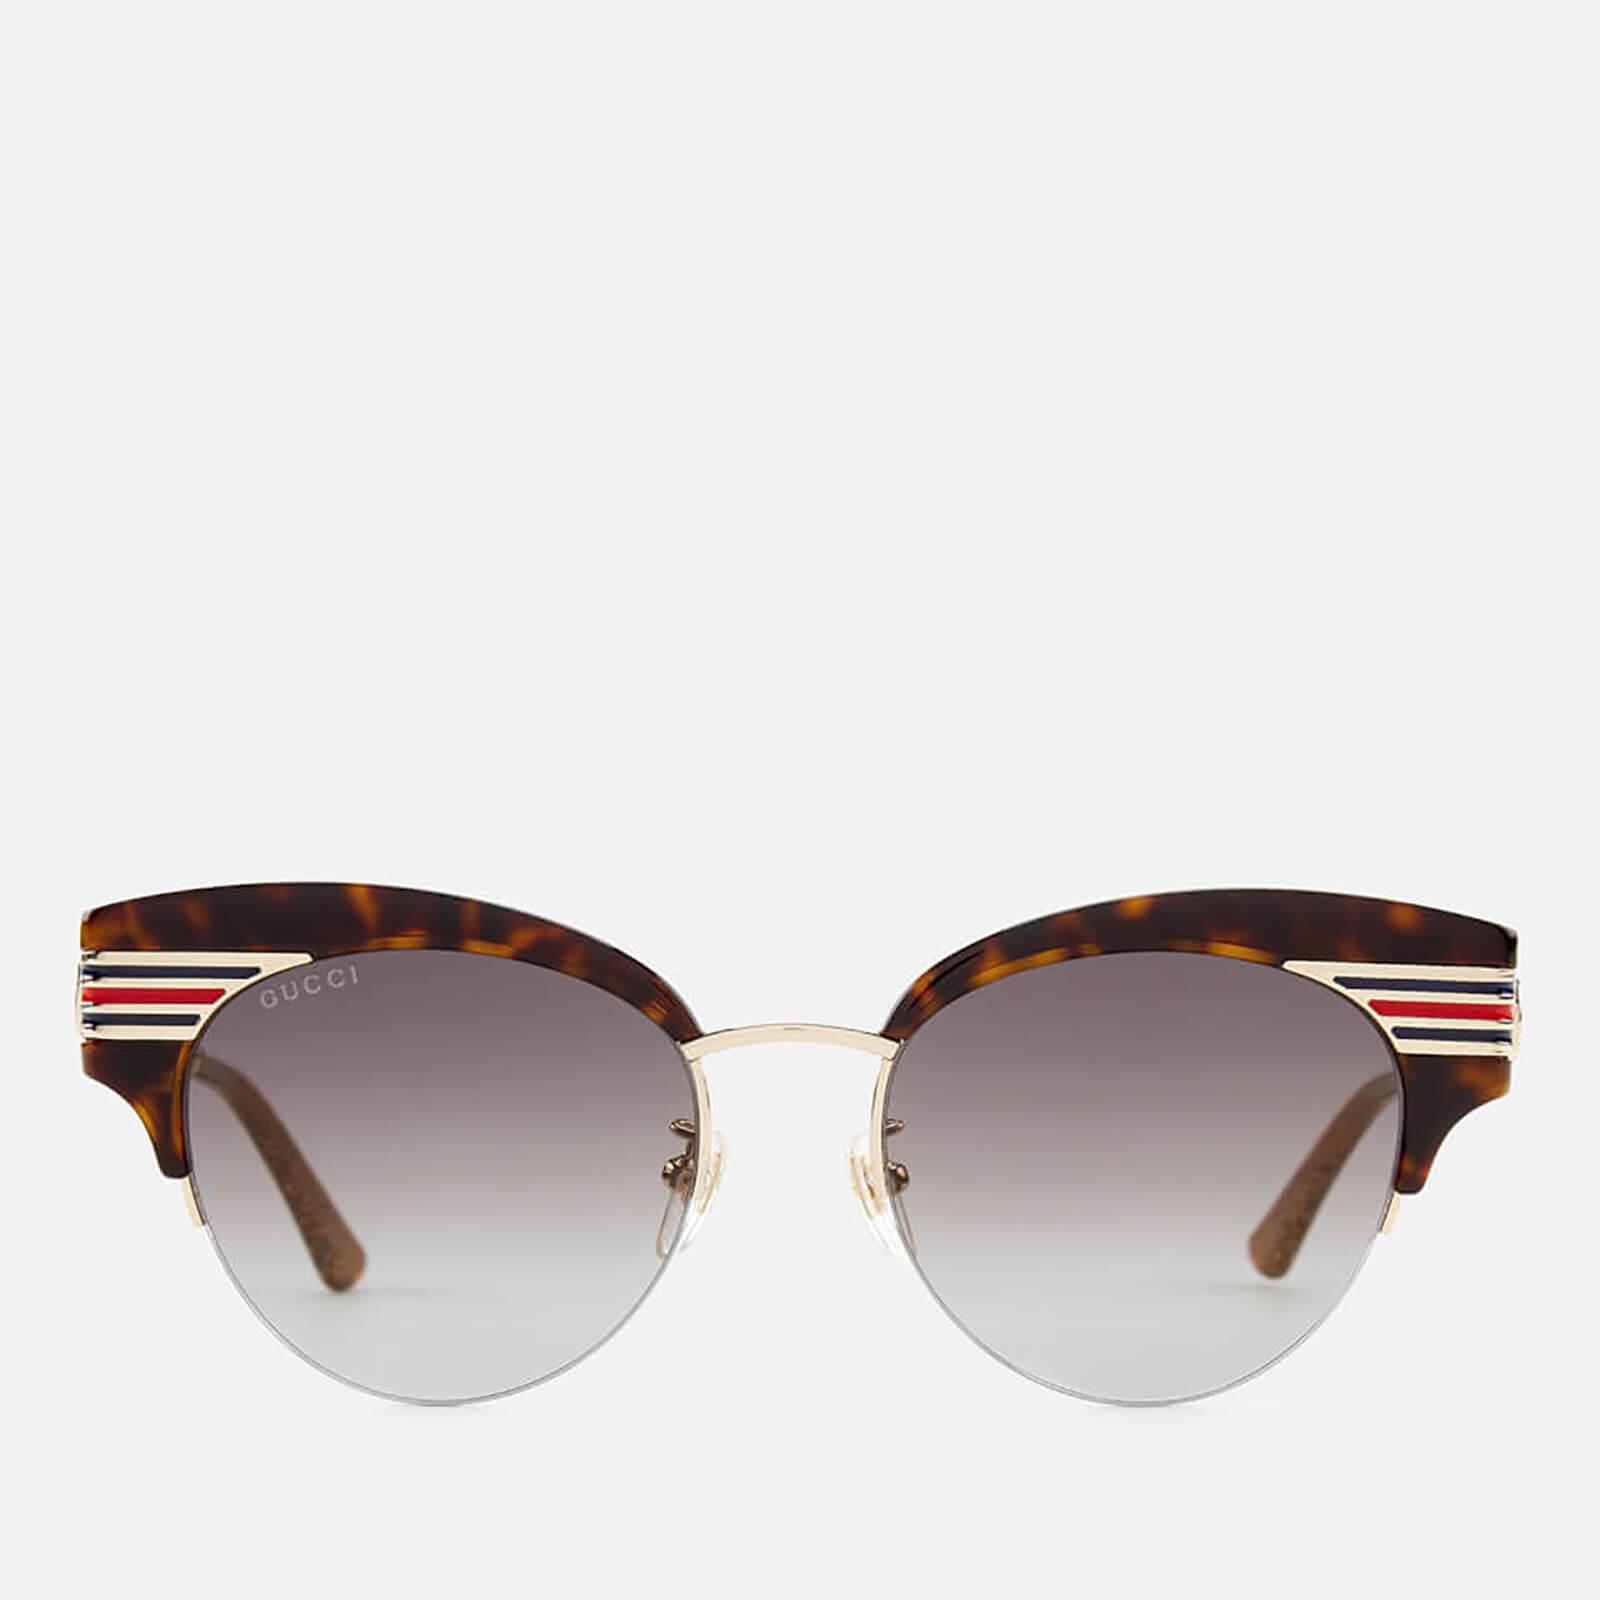 9fa7bae6b0 Gucci Women s Cat Eye Sunglasses - Havana Gold Brown - Free UK Delivery over  £50